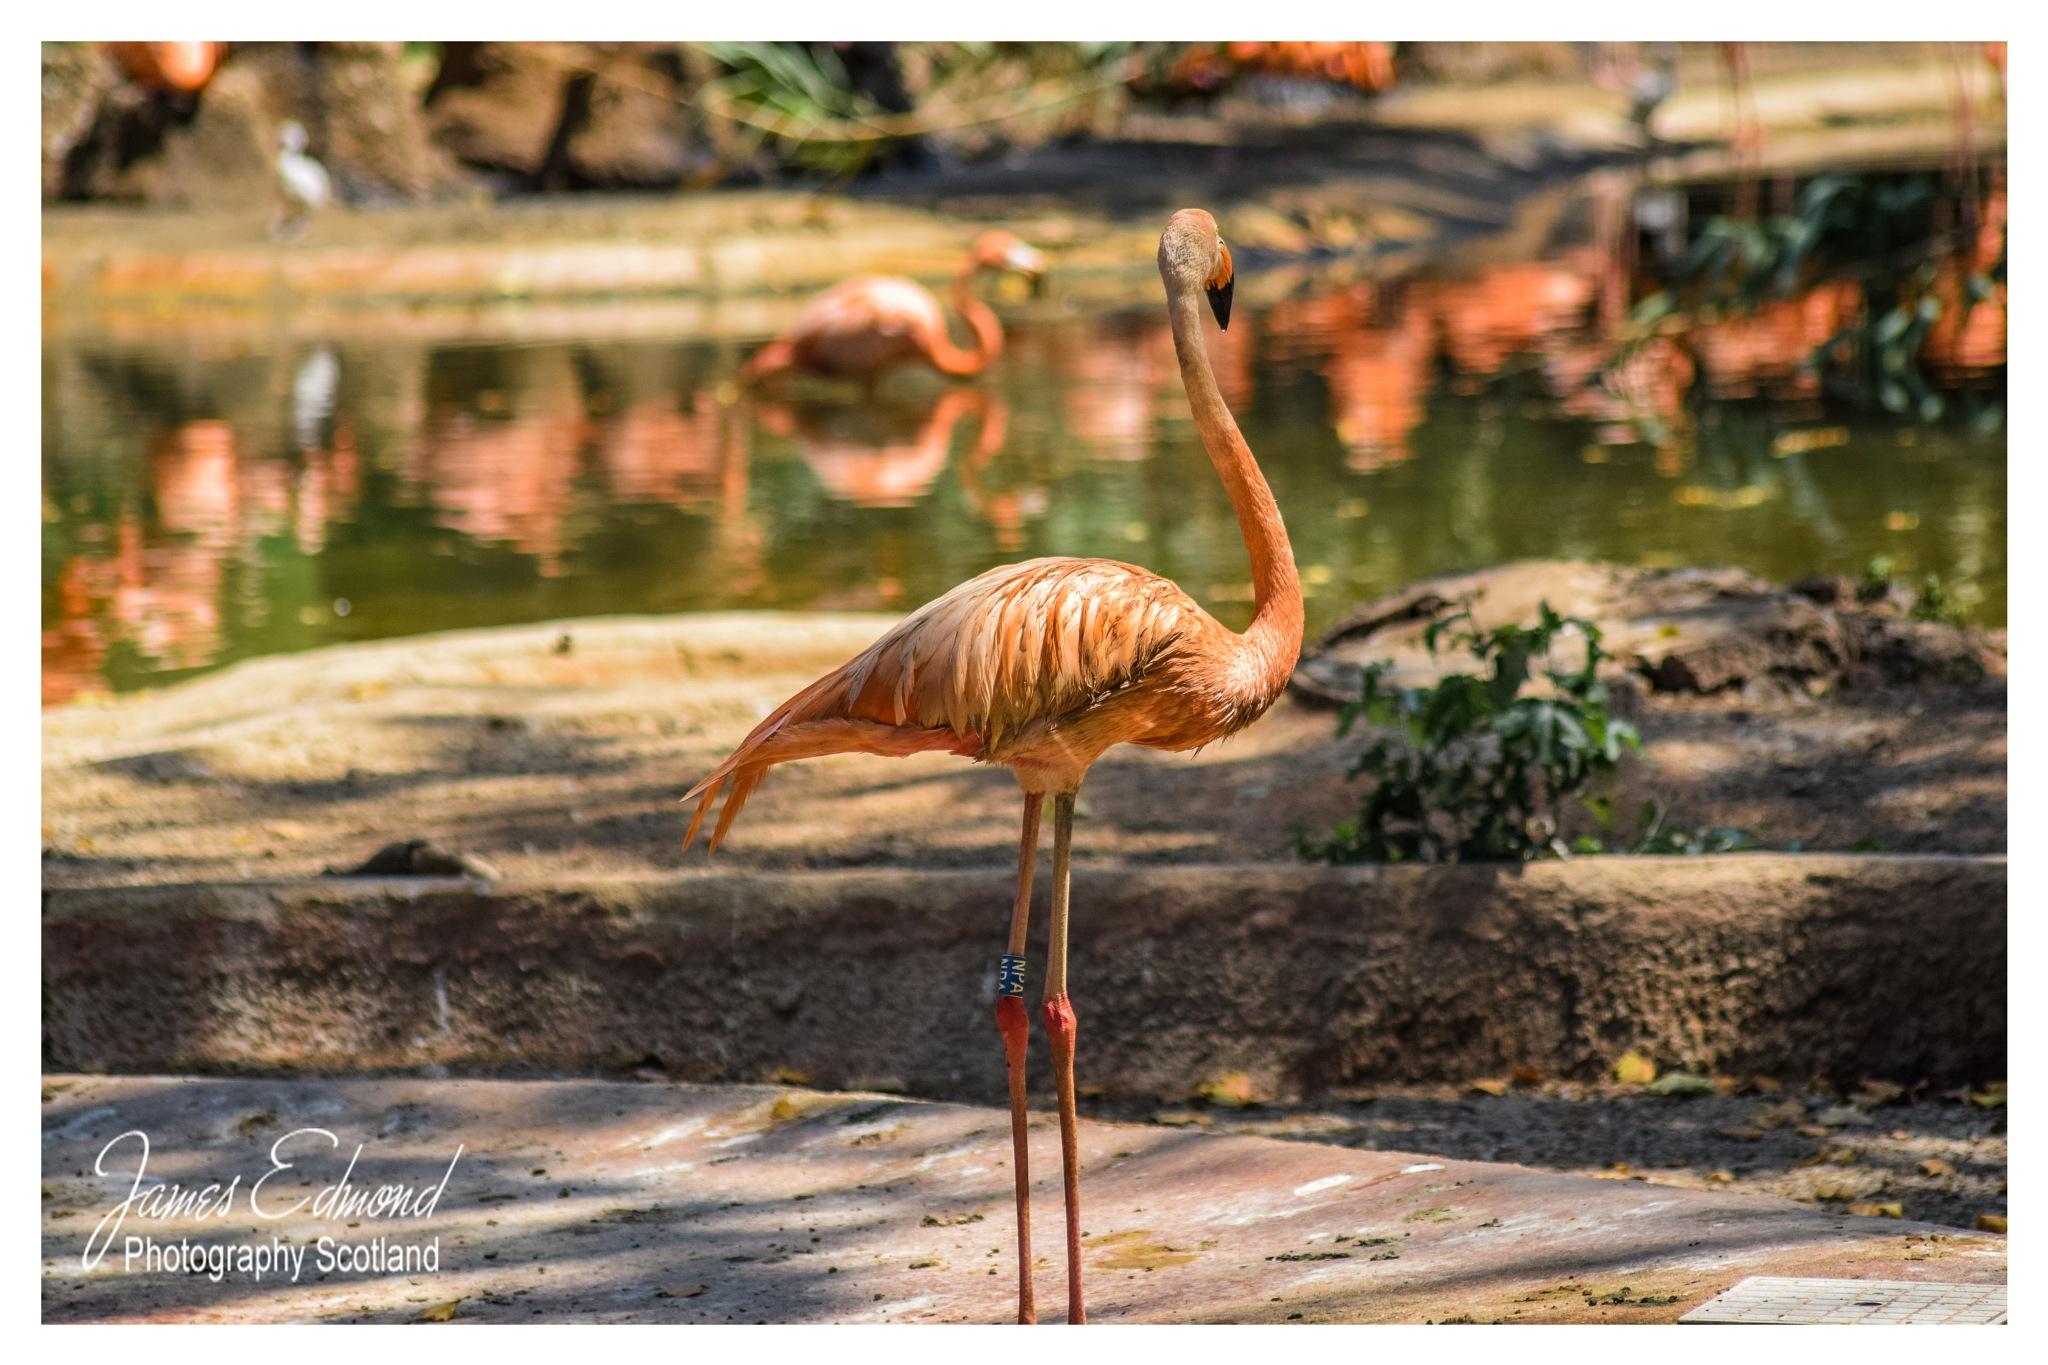 Flamingo by James Edmond Photography